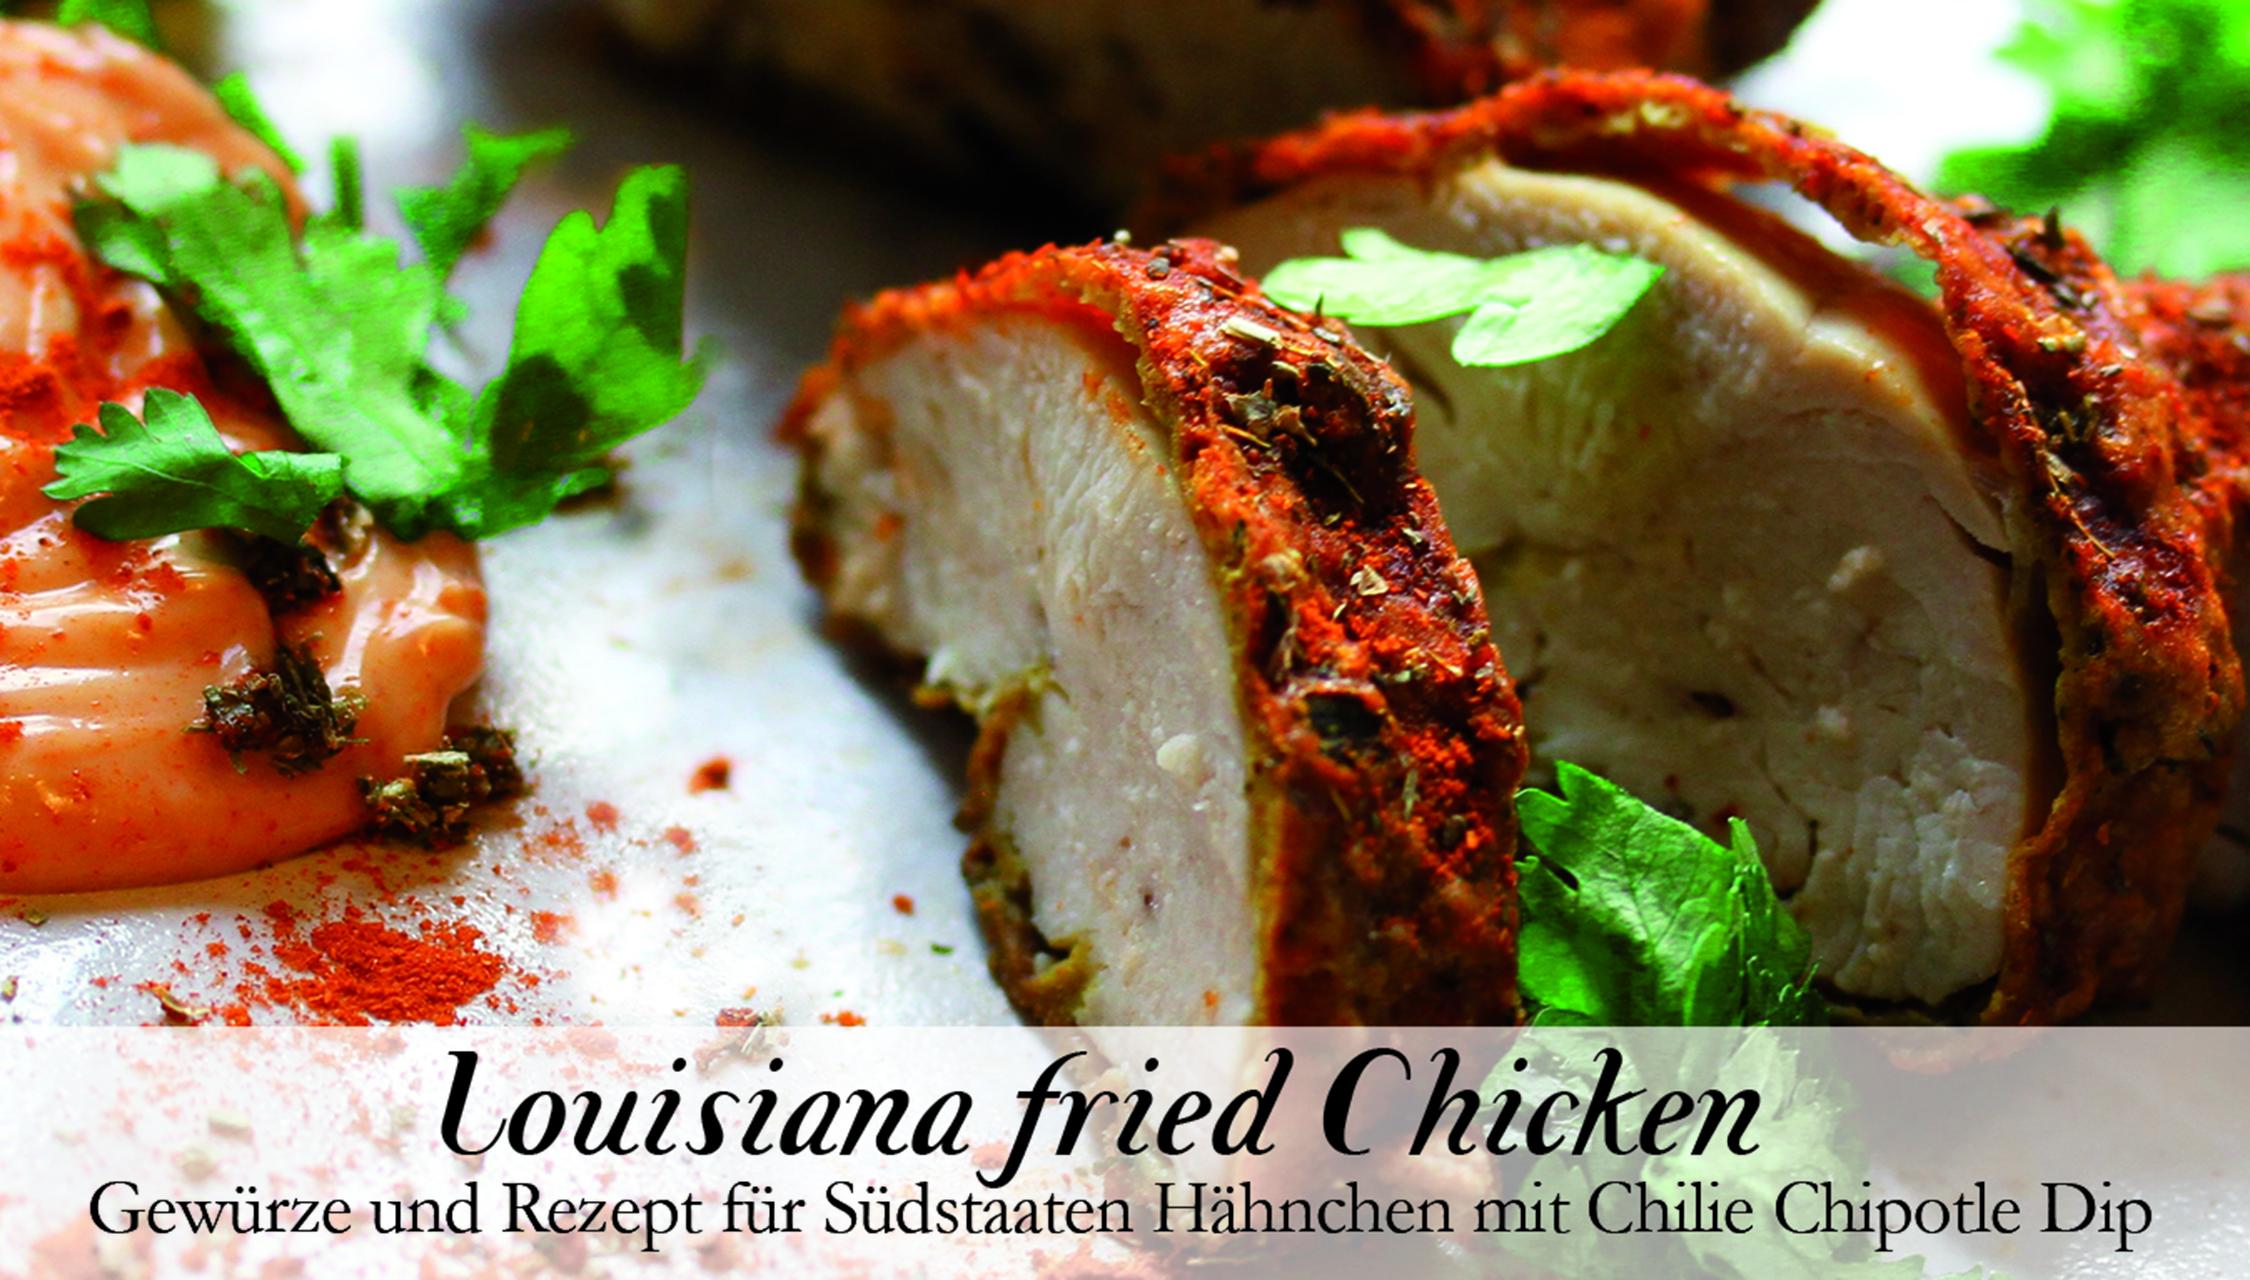 Lousiana fried Chicken